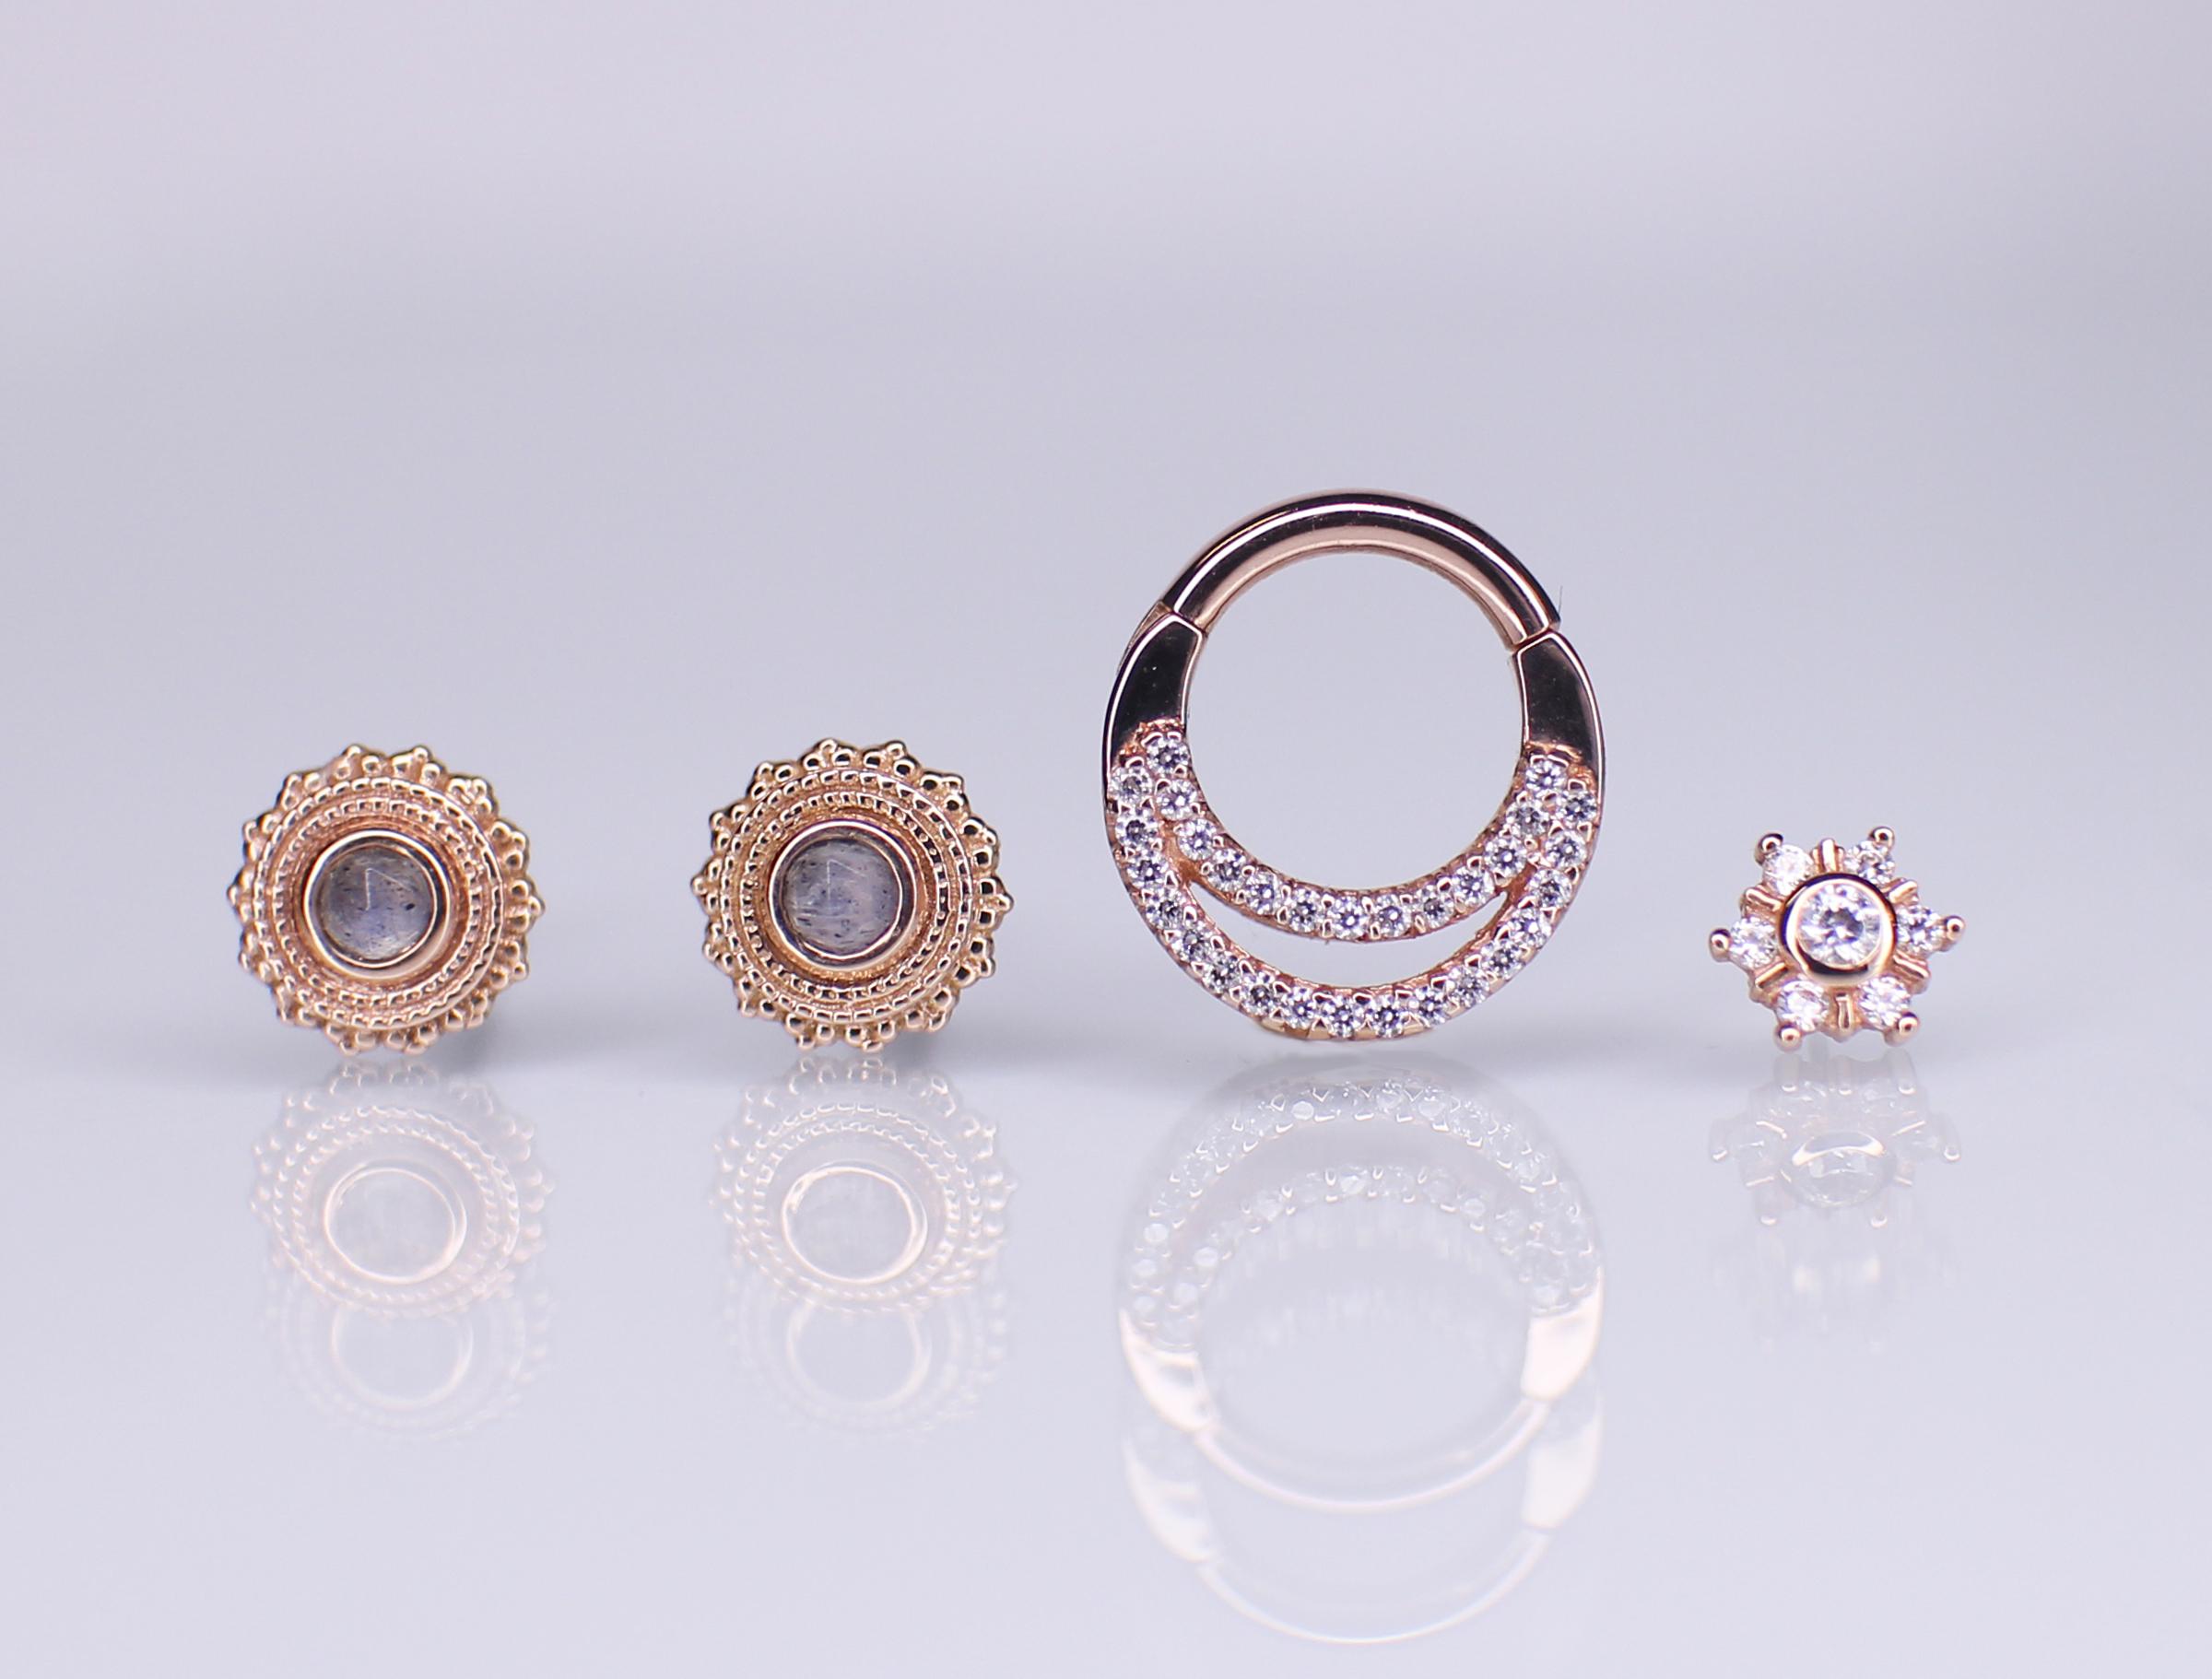 Jewelry IMG_9319 BVLA RG Afghan Laboradorite Janesca Toltec.jpg